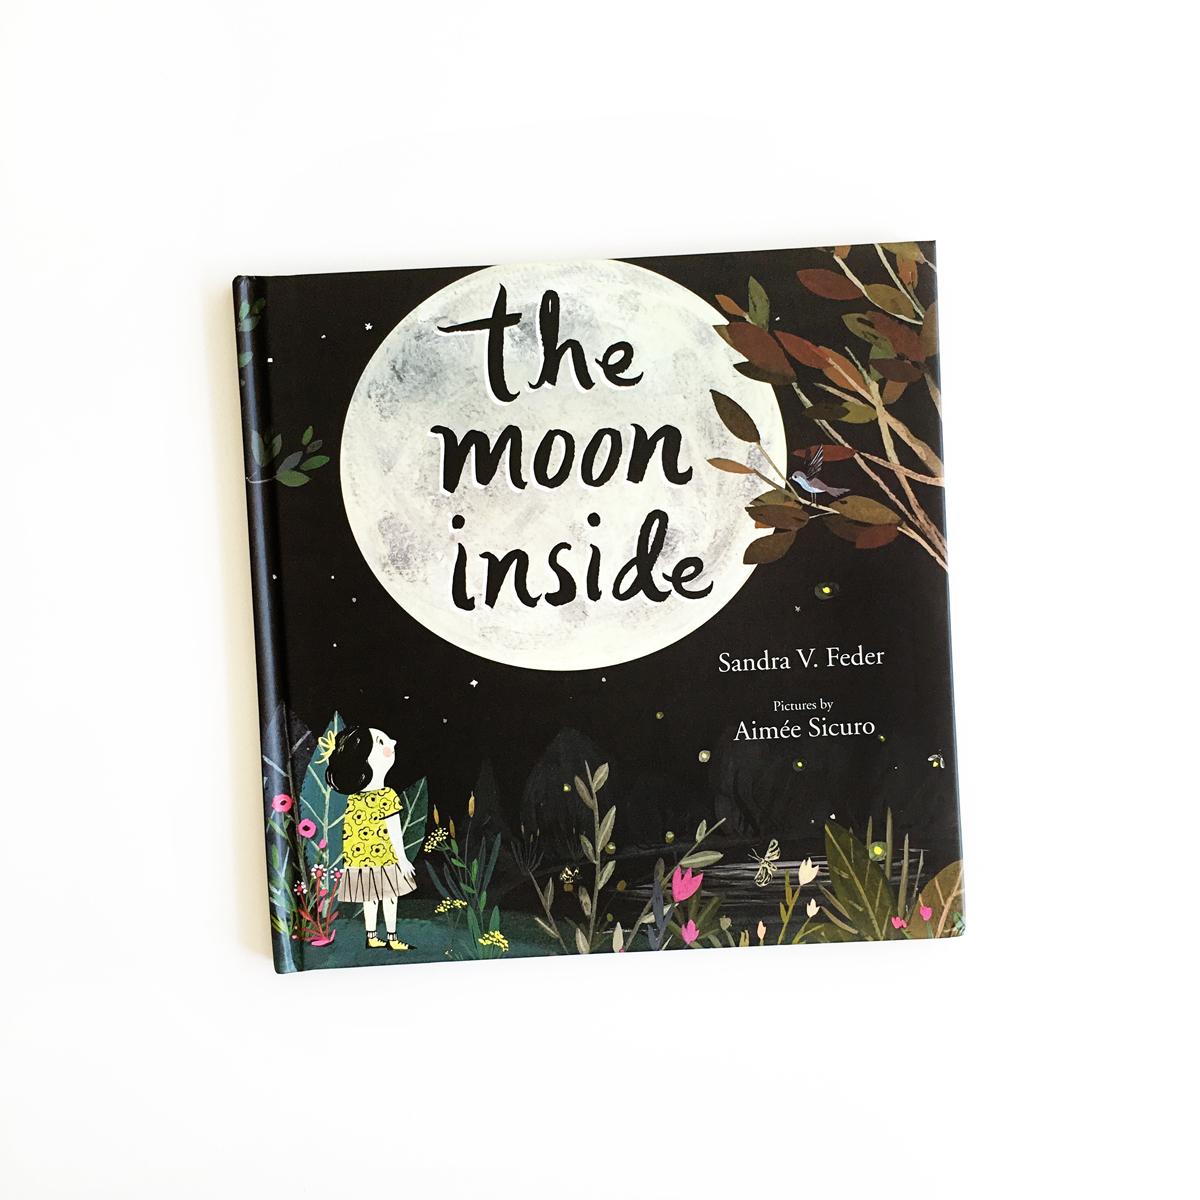 The Moon Inside | Little Lit Book Series